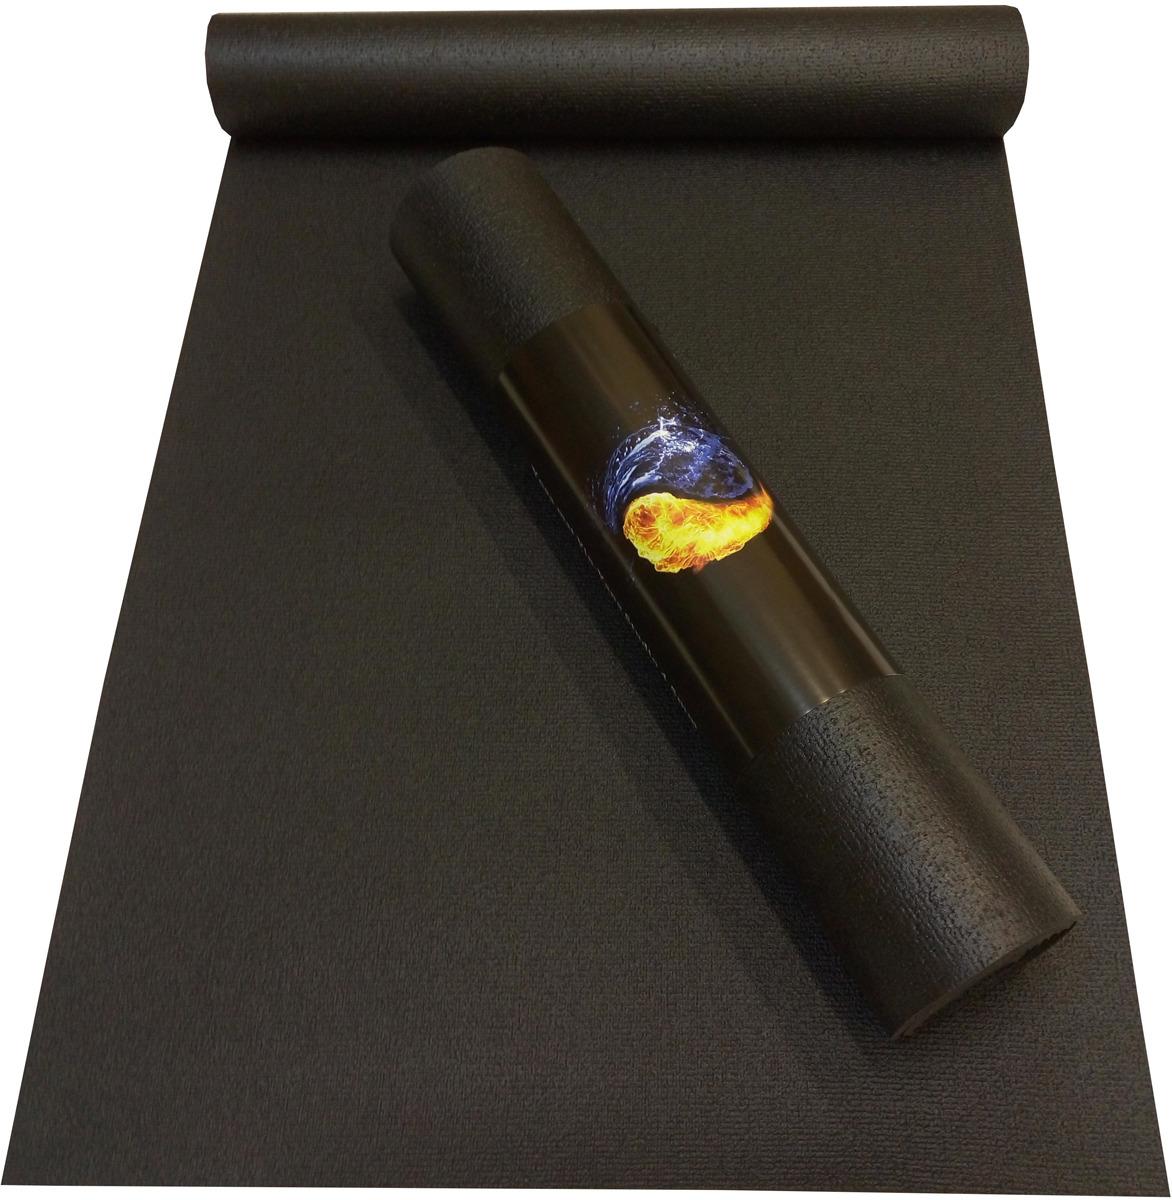 Коврик для йоги Ako-Yoga Yin-Yang Studio, цвет: черный, 185 х 60 х 0,45 см